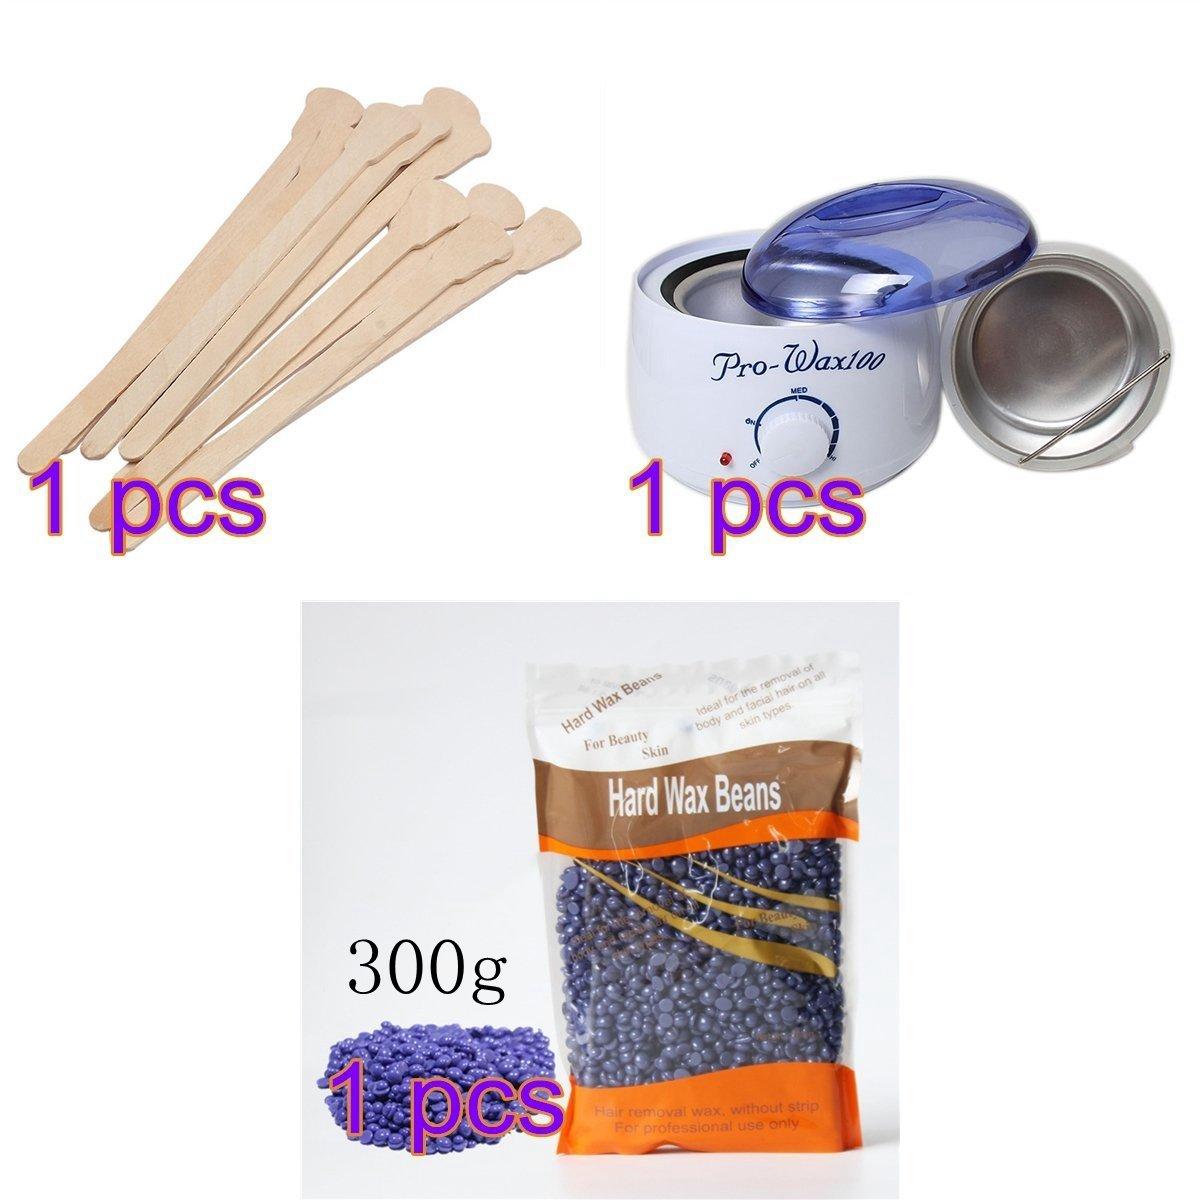 ASDOMO 500CC Portable Electric Hair Removal Wax Warmer+10.58 OZ Hair Removal Hard Wax Beans+10PCS Wax Applicator Sticks